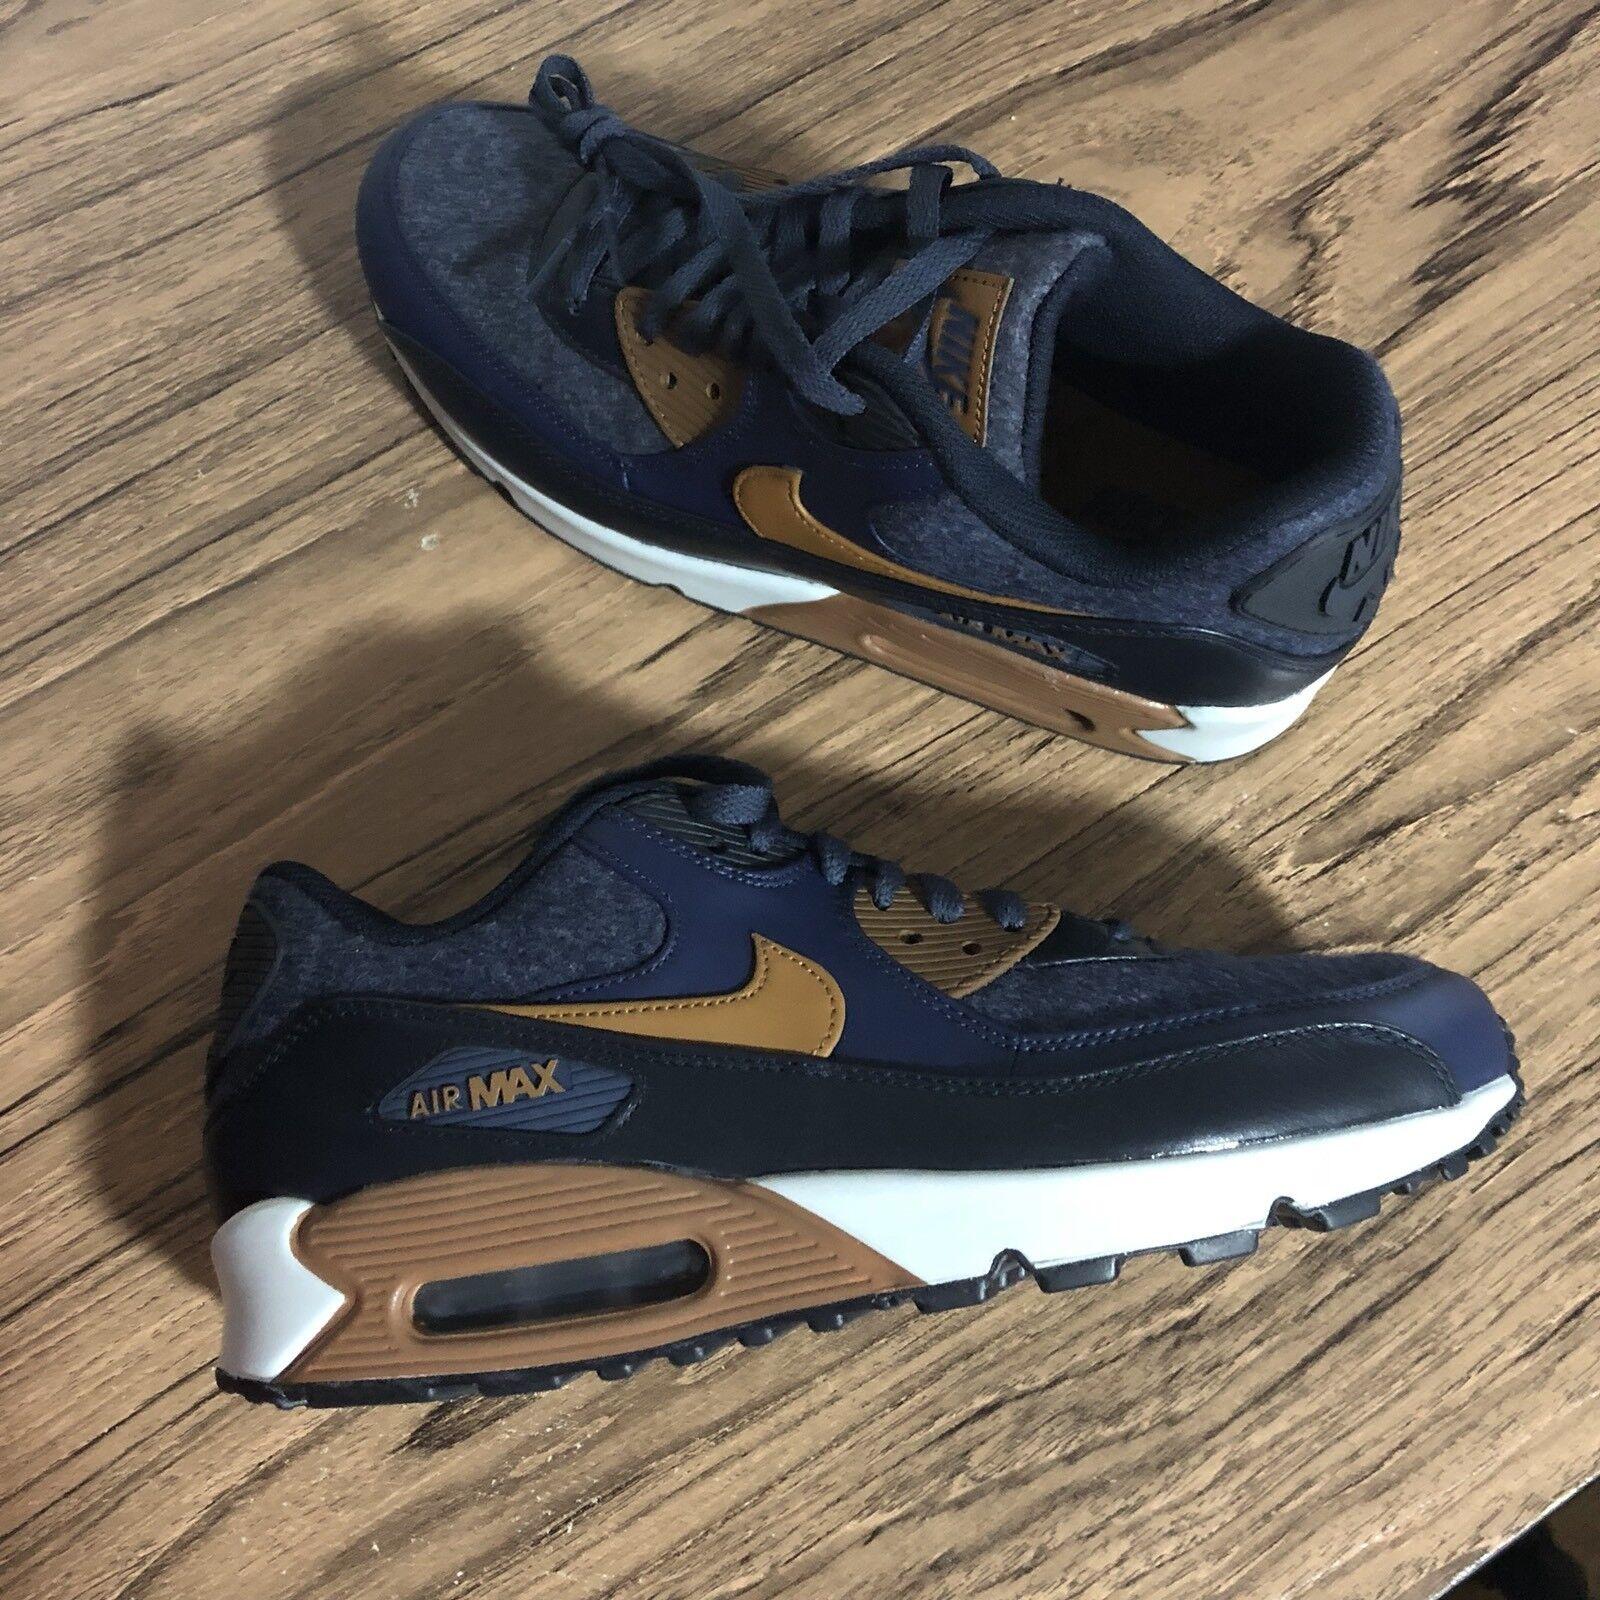 461576084bdda A790G Nike Air Max 90 Premium Premium Premium Thunder Blue 700155-404 Mens  Sneaker Size 11.5 NEW c18dc5